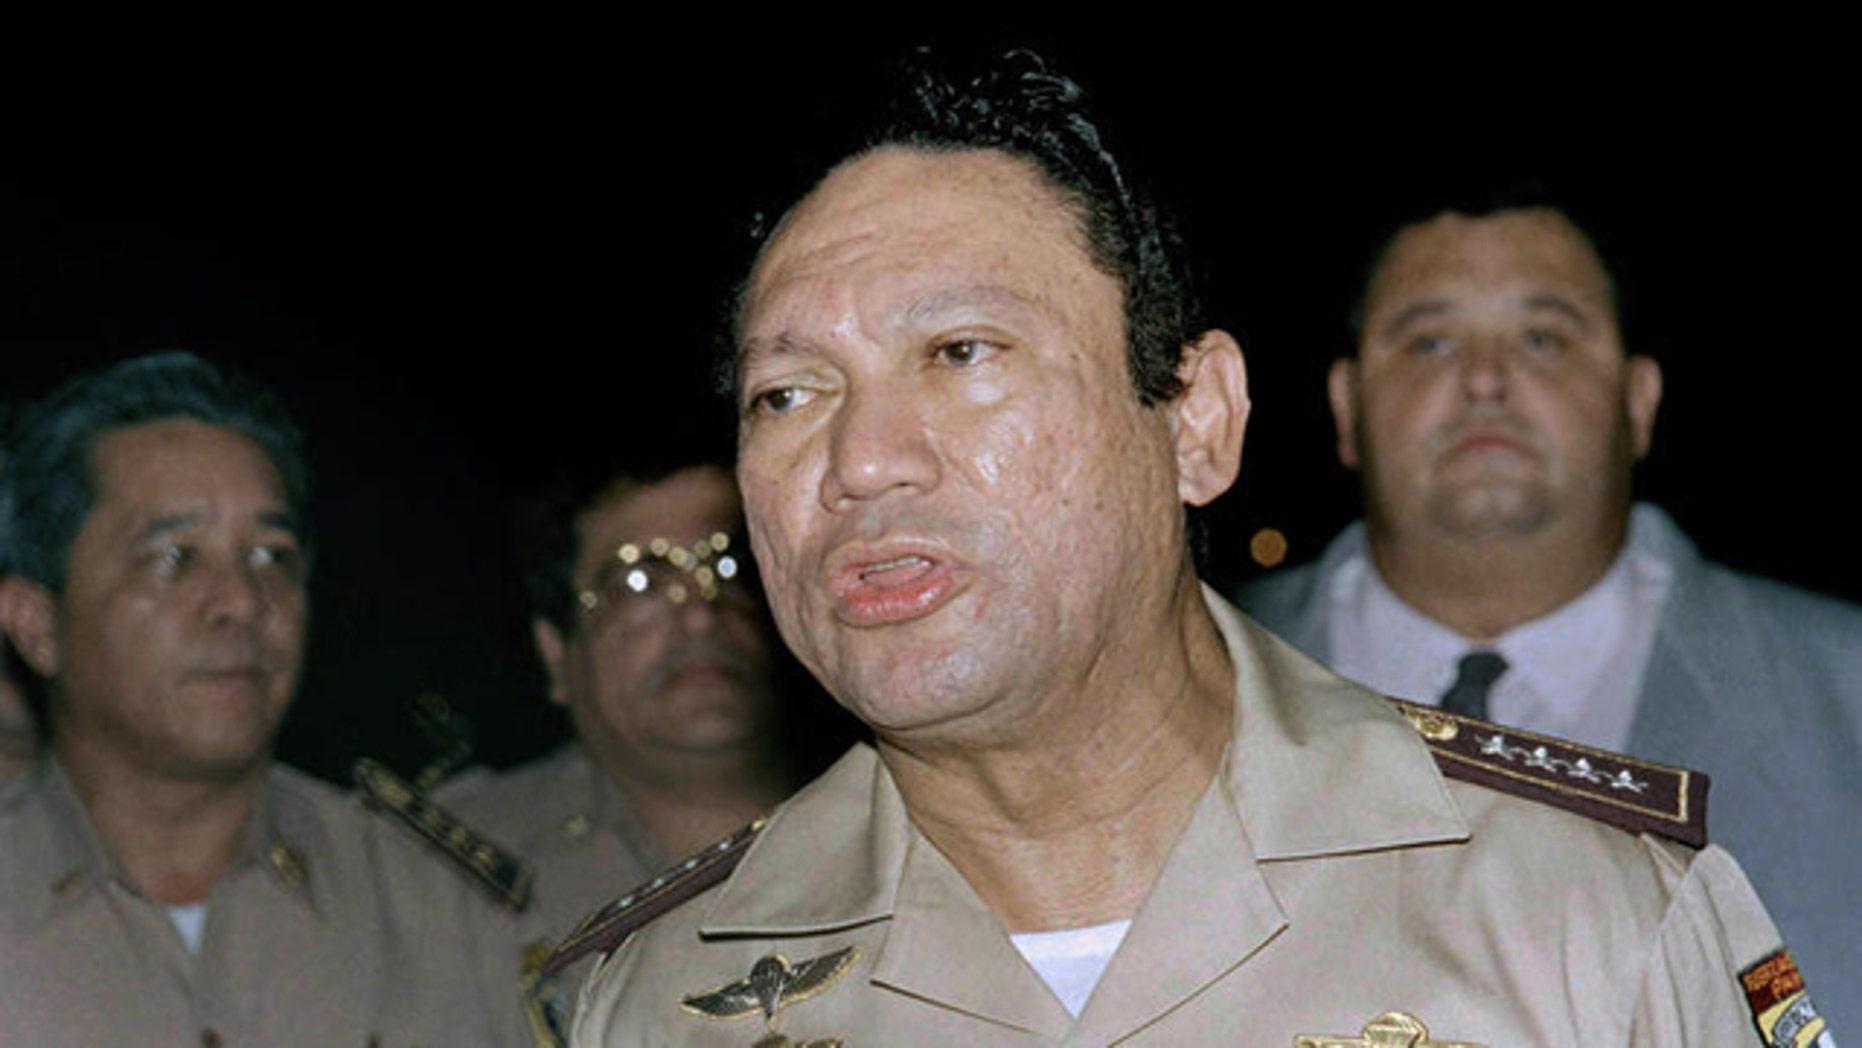 This 1989 photo shows Panama military dictator Manuel Noriega speaking to the media (AP)